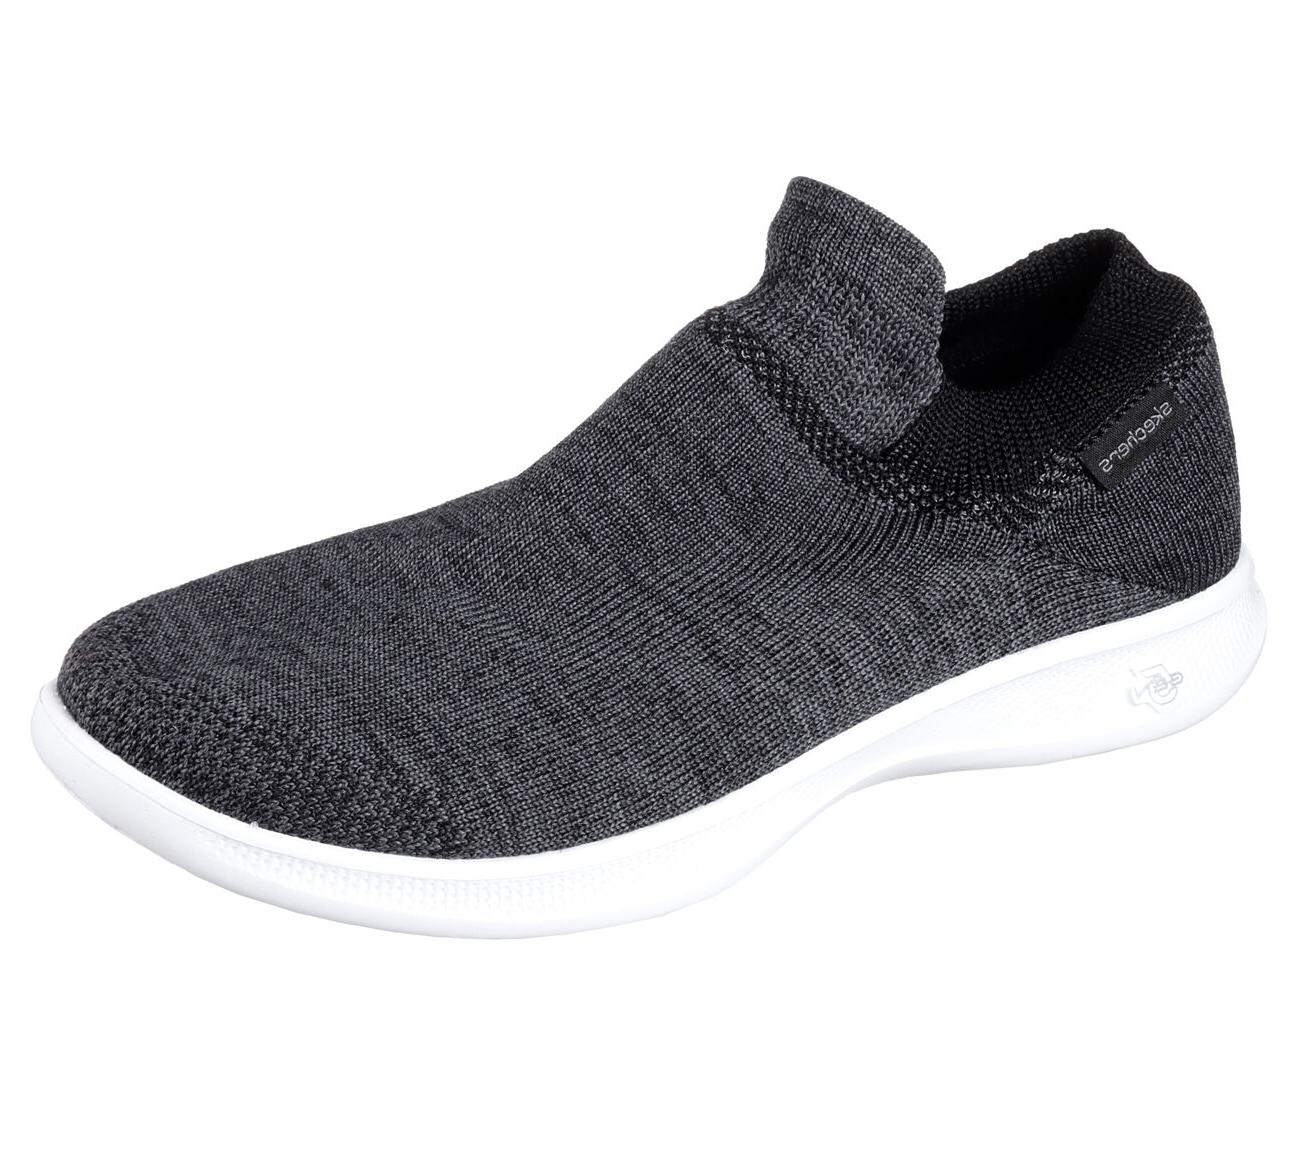 Skechers Ultra Sock Shoes | Sockd